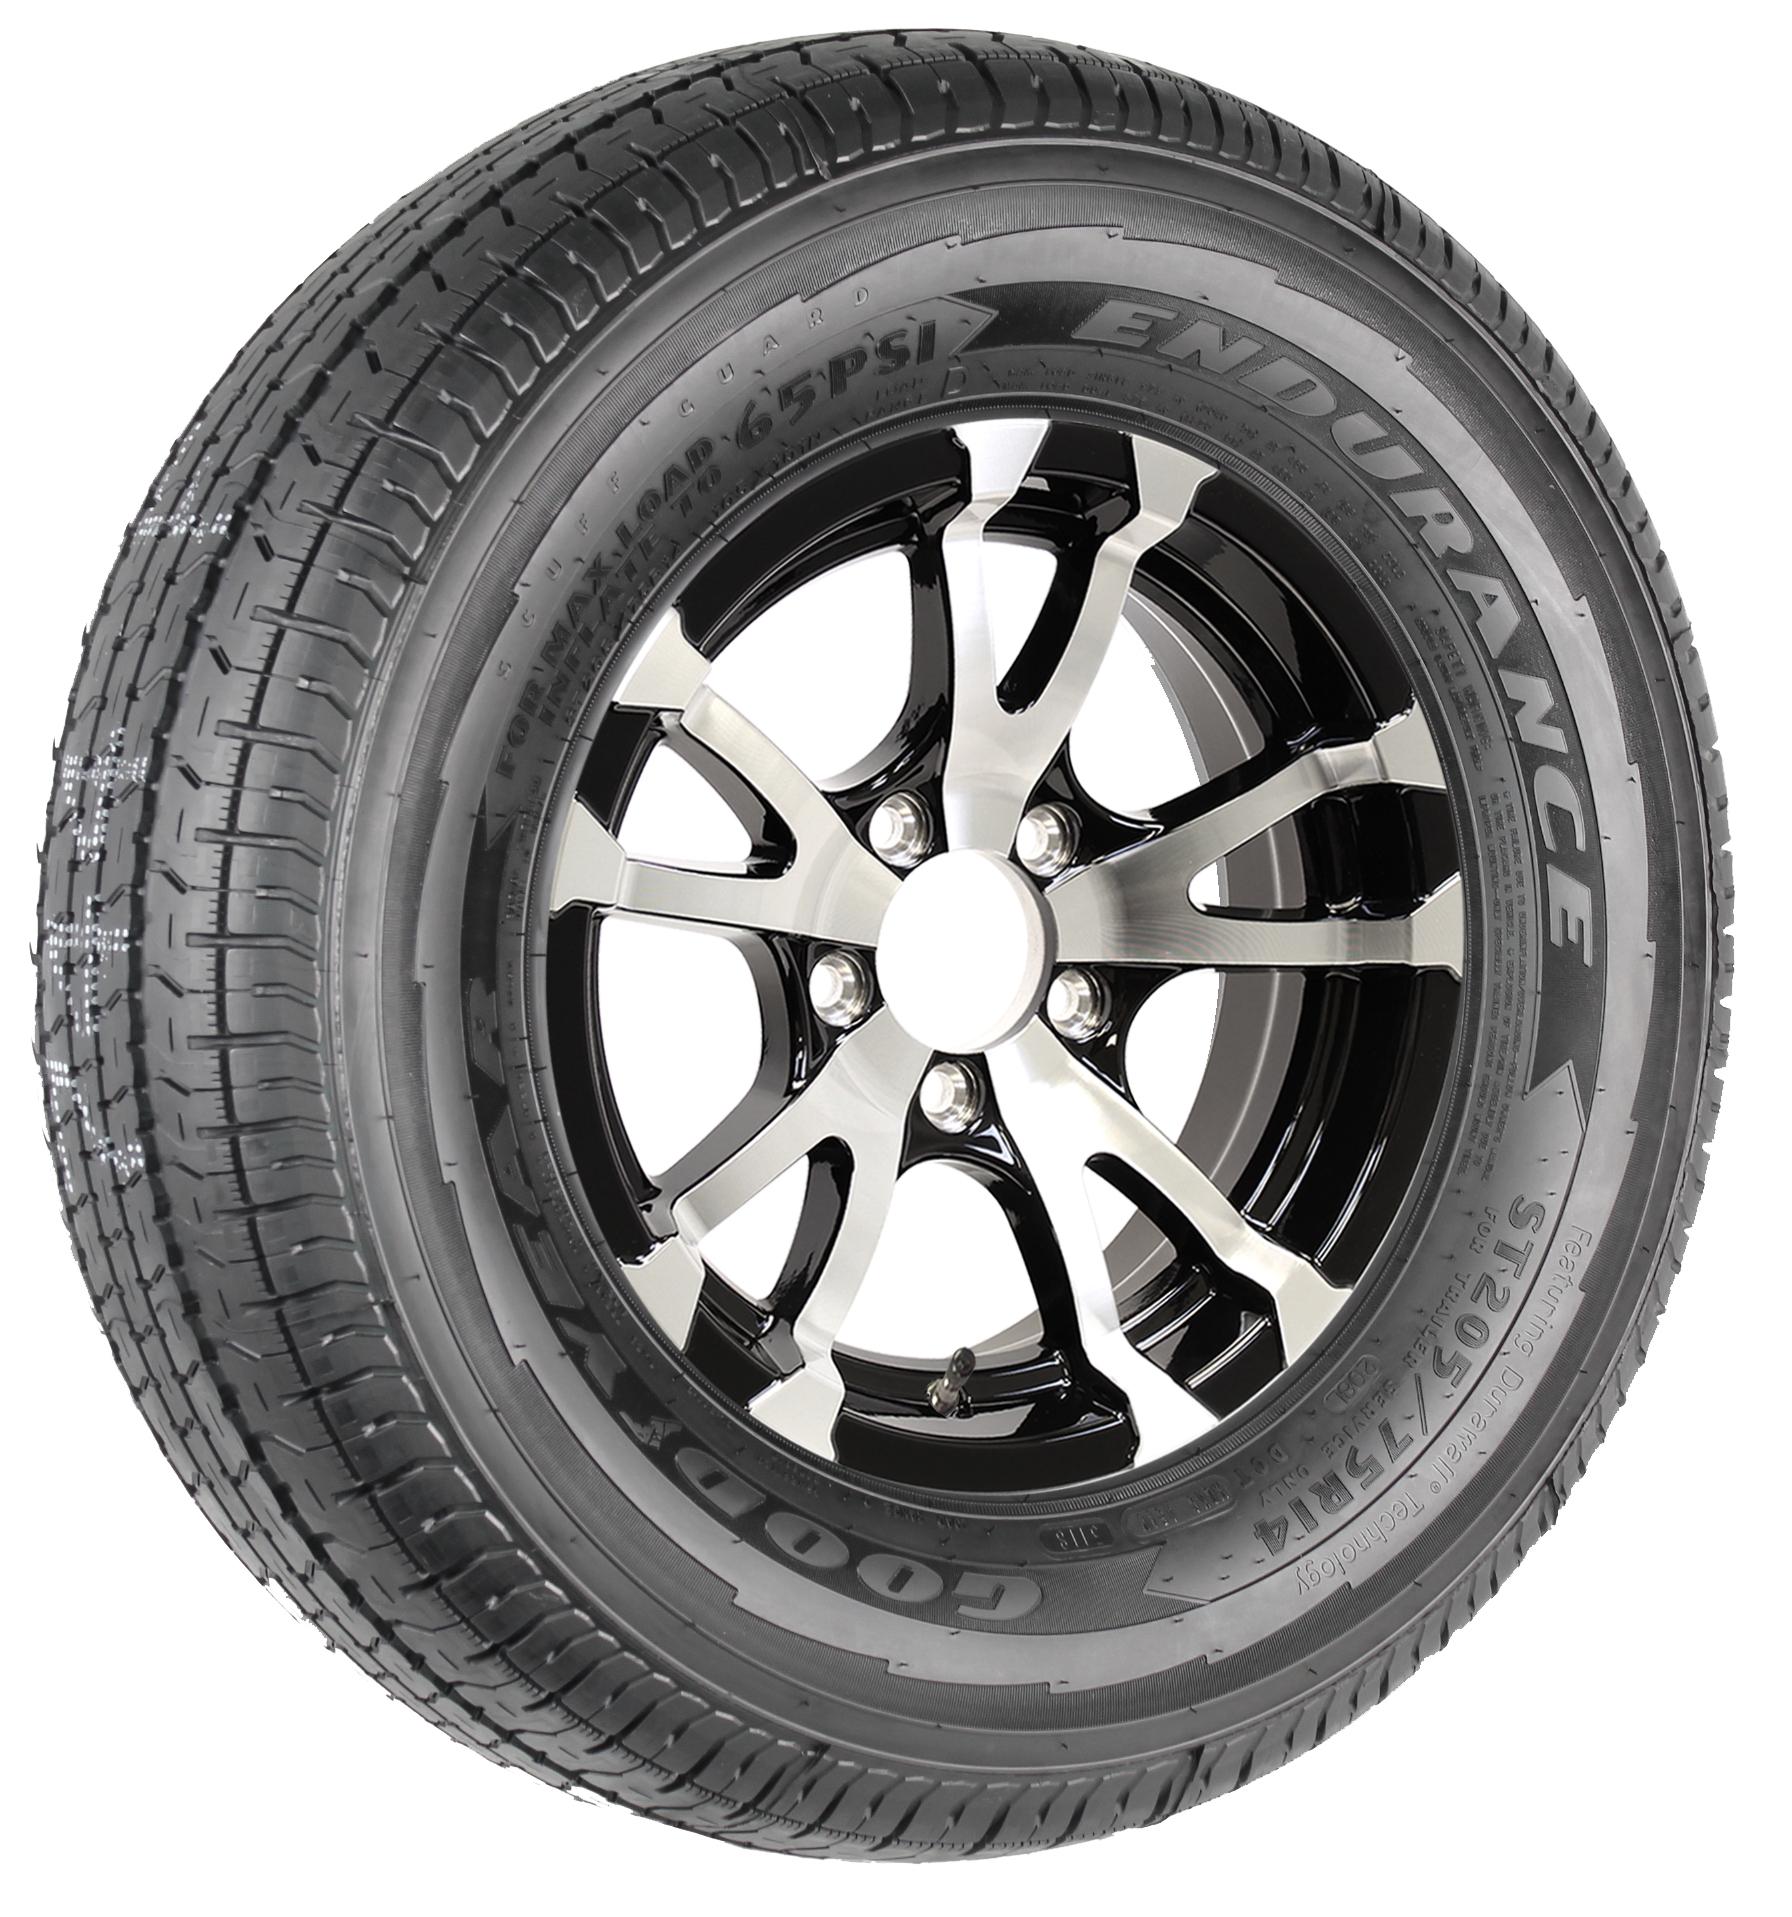 "Goodyear Endurance ST205/75R14 LRD Radial Tire on 14"" 5-Lug Avalanche Black Aluminum Assembly Image"